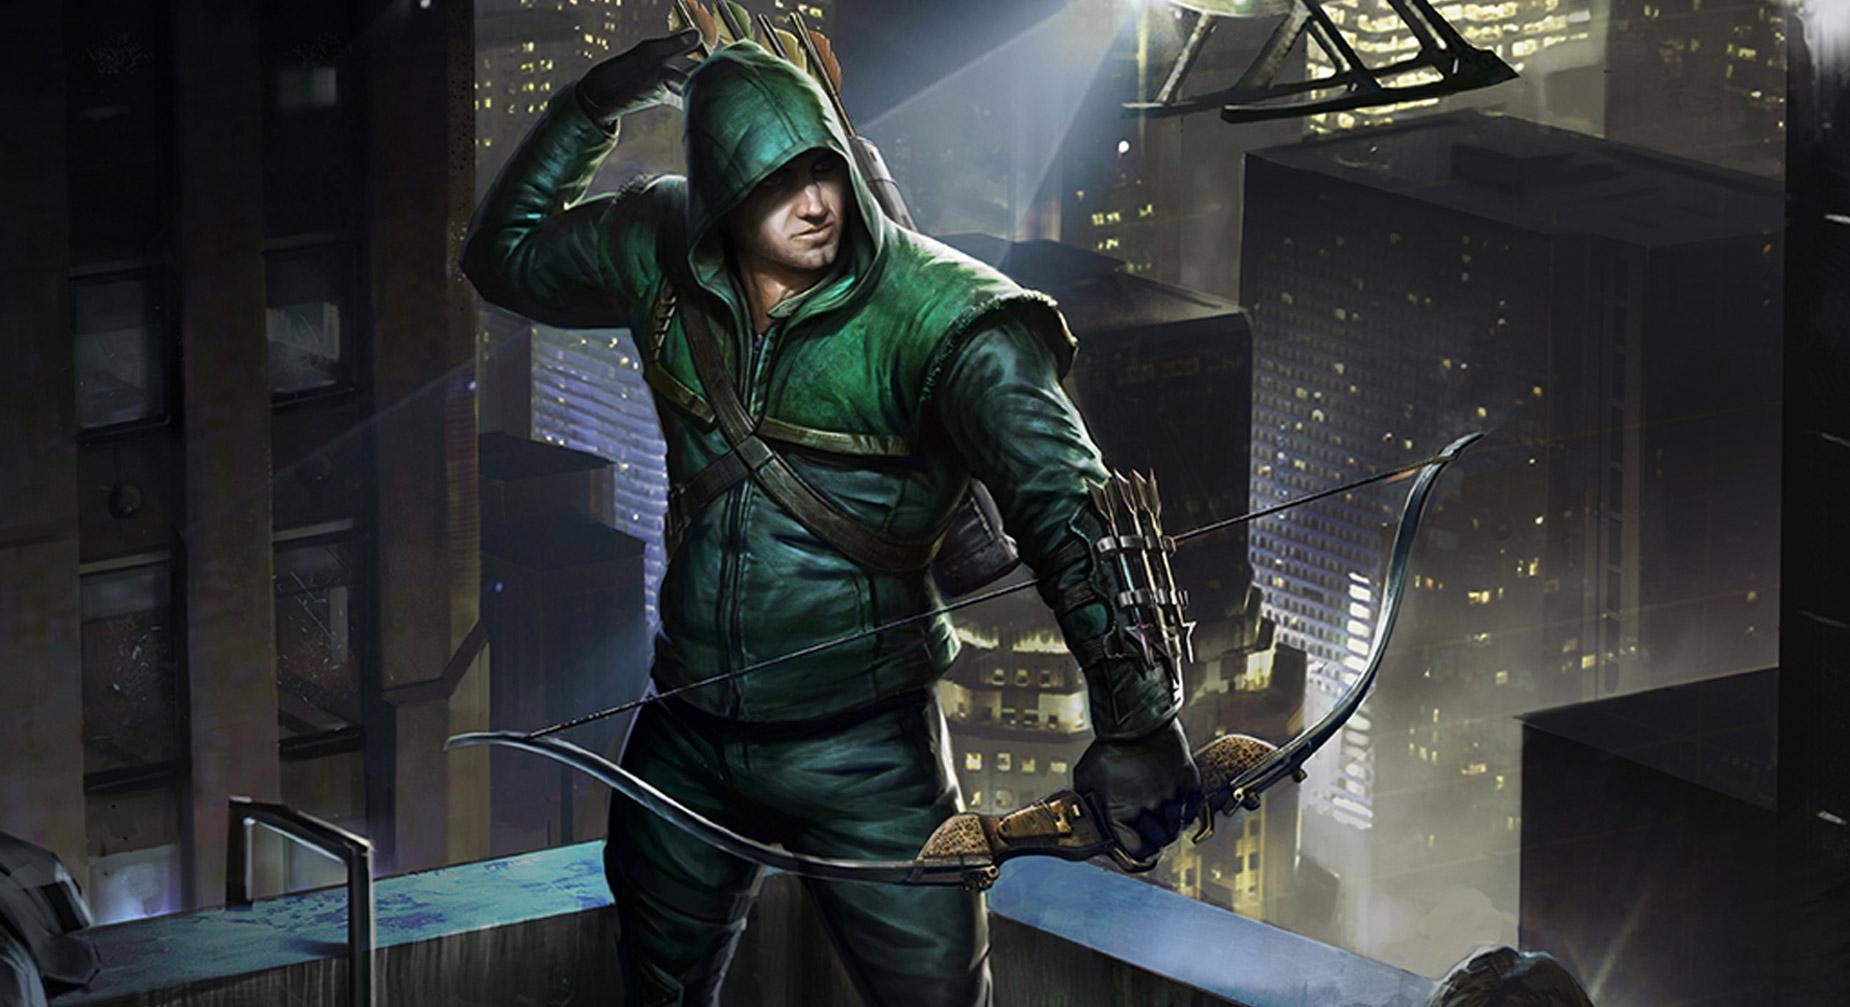 Green Arrows City Green Arrow/costumes